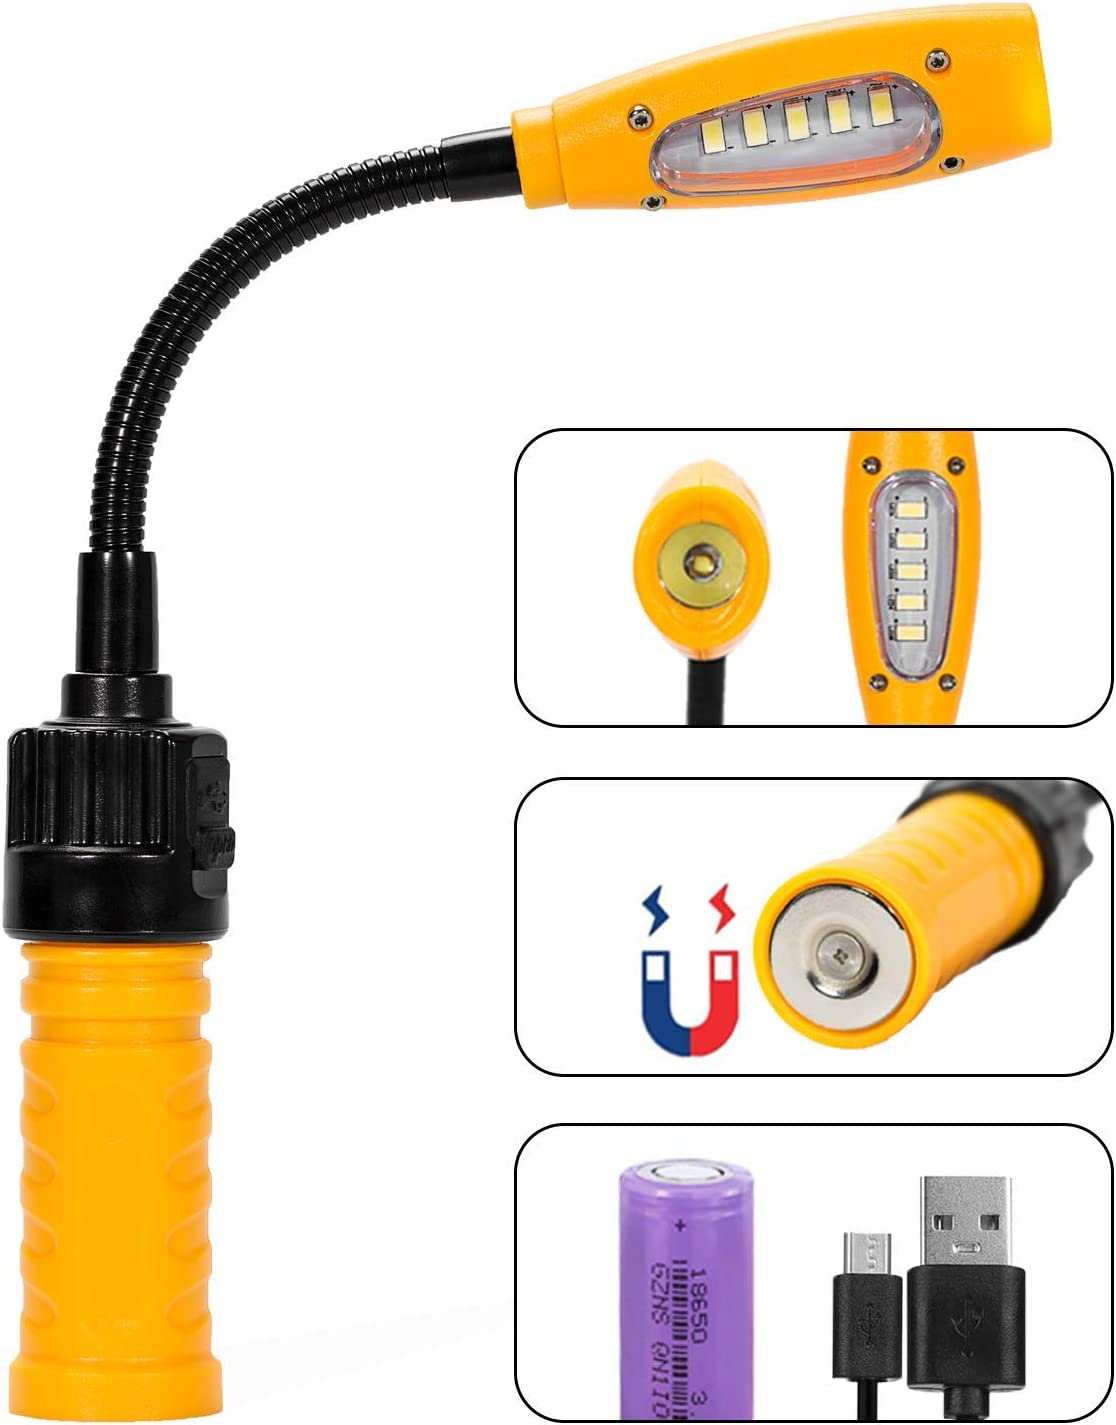 Elusefor Bright Cordless Work Light Usb Rechargeable Cob Led